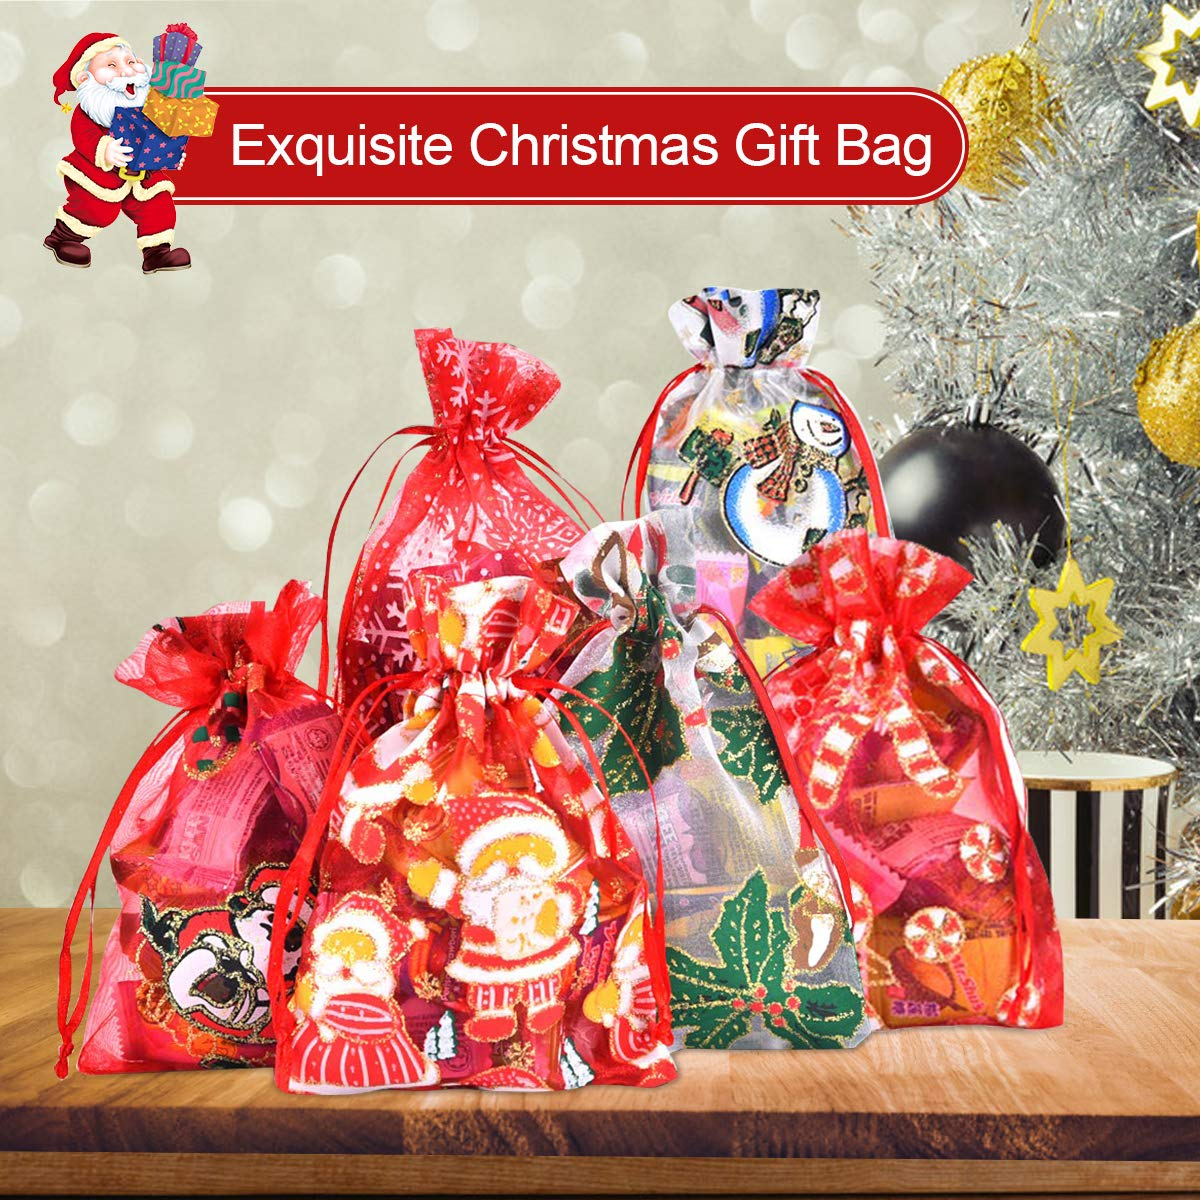 Blanco 4X 6 Pulgadas Bolsas de Regalo de Organza para obsequios Rojo Verde PHOGARY 20 Pack Bolsas de cord/ón navide/ñas